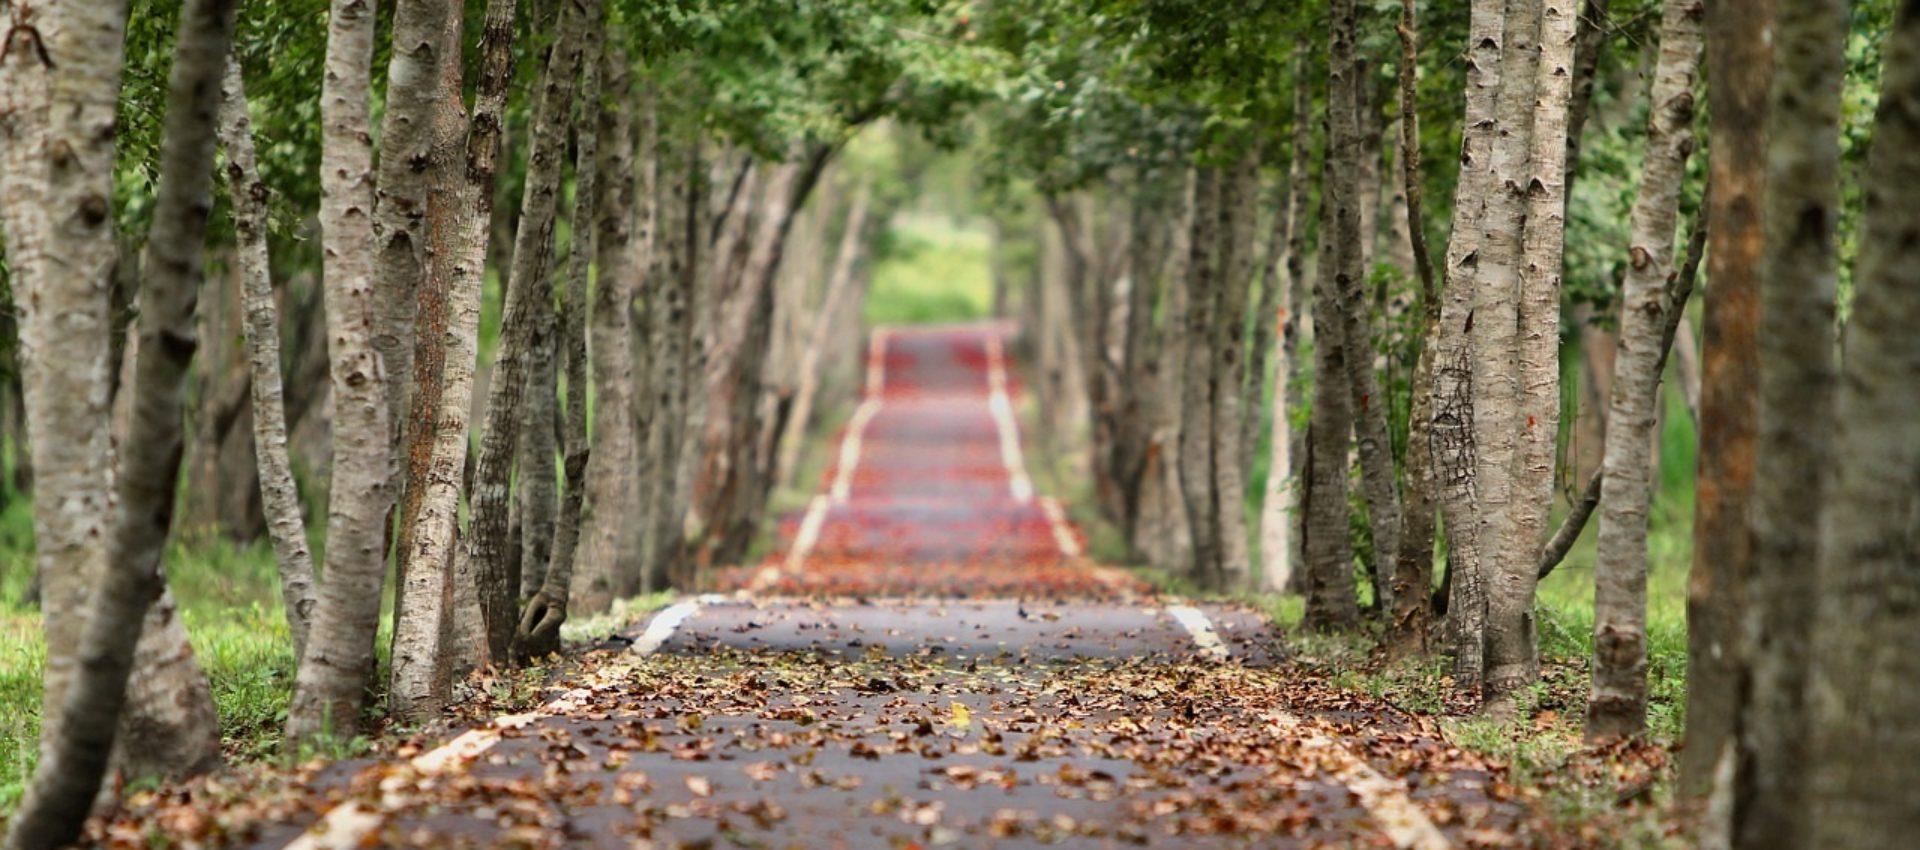 cropped-woodland-656969_1280.jpg